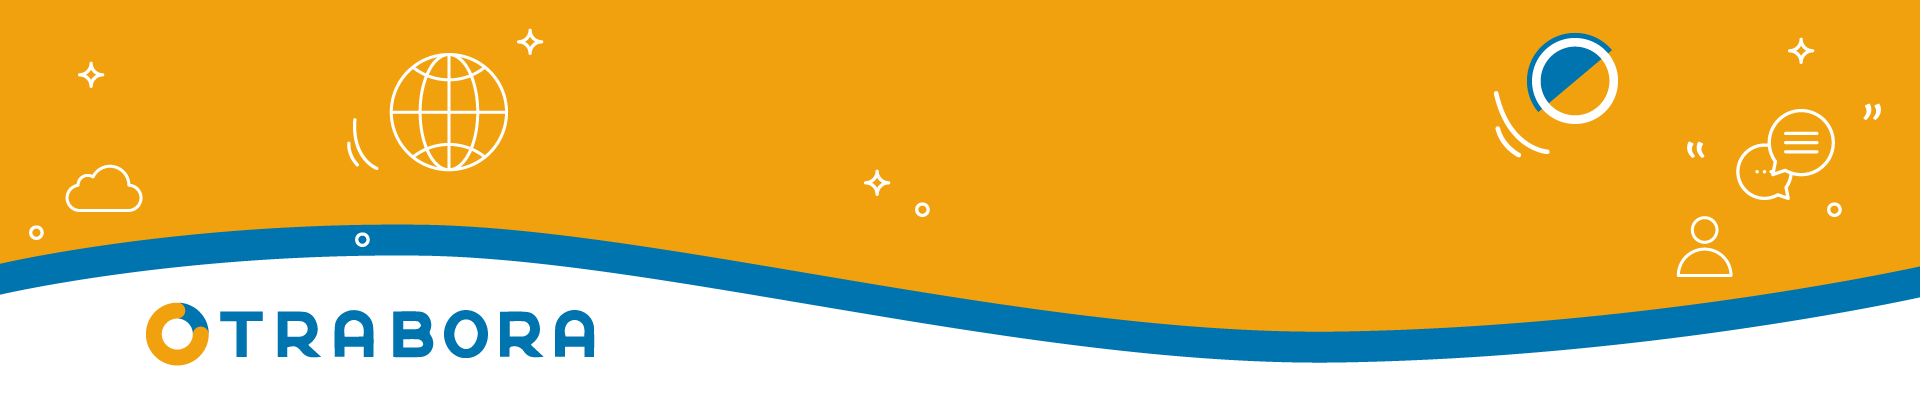 banner-web-trabora